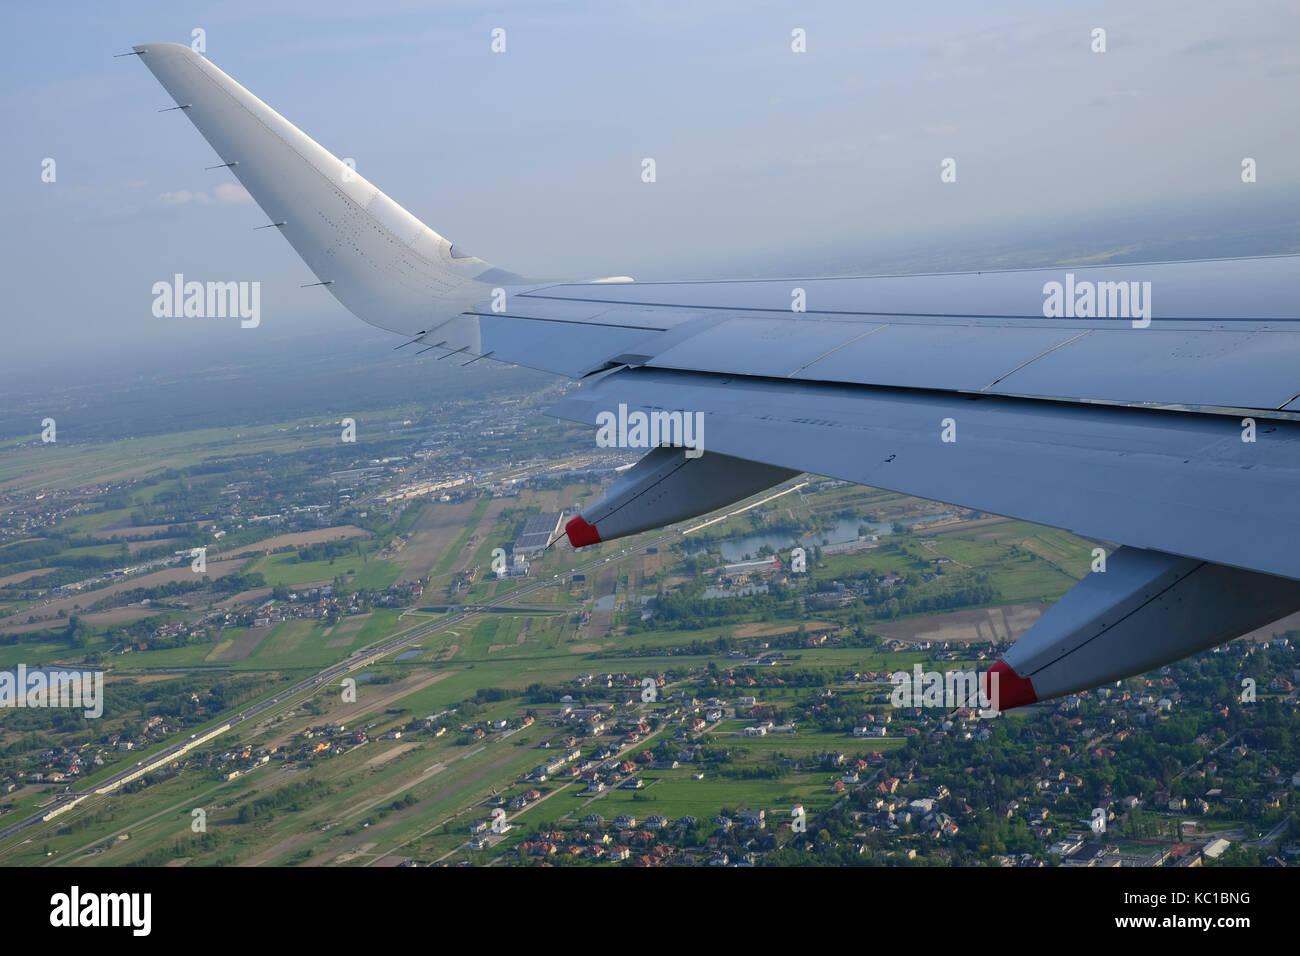 Passenger aircraft approaching Okecie International, Chopin Airport, Warsaw, Poland - Stock Image